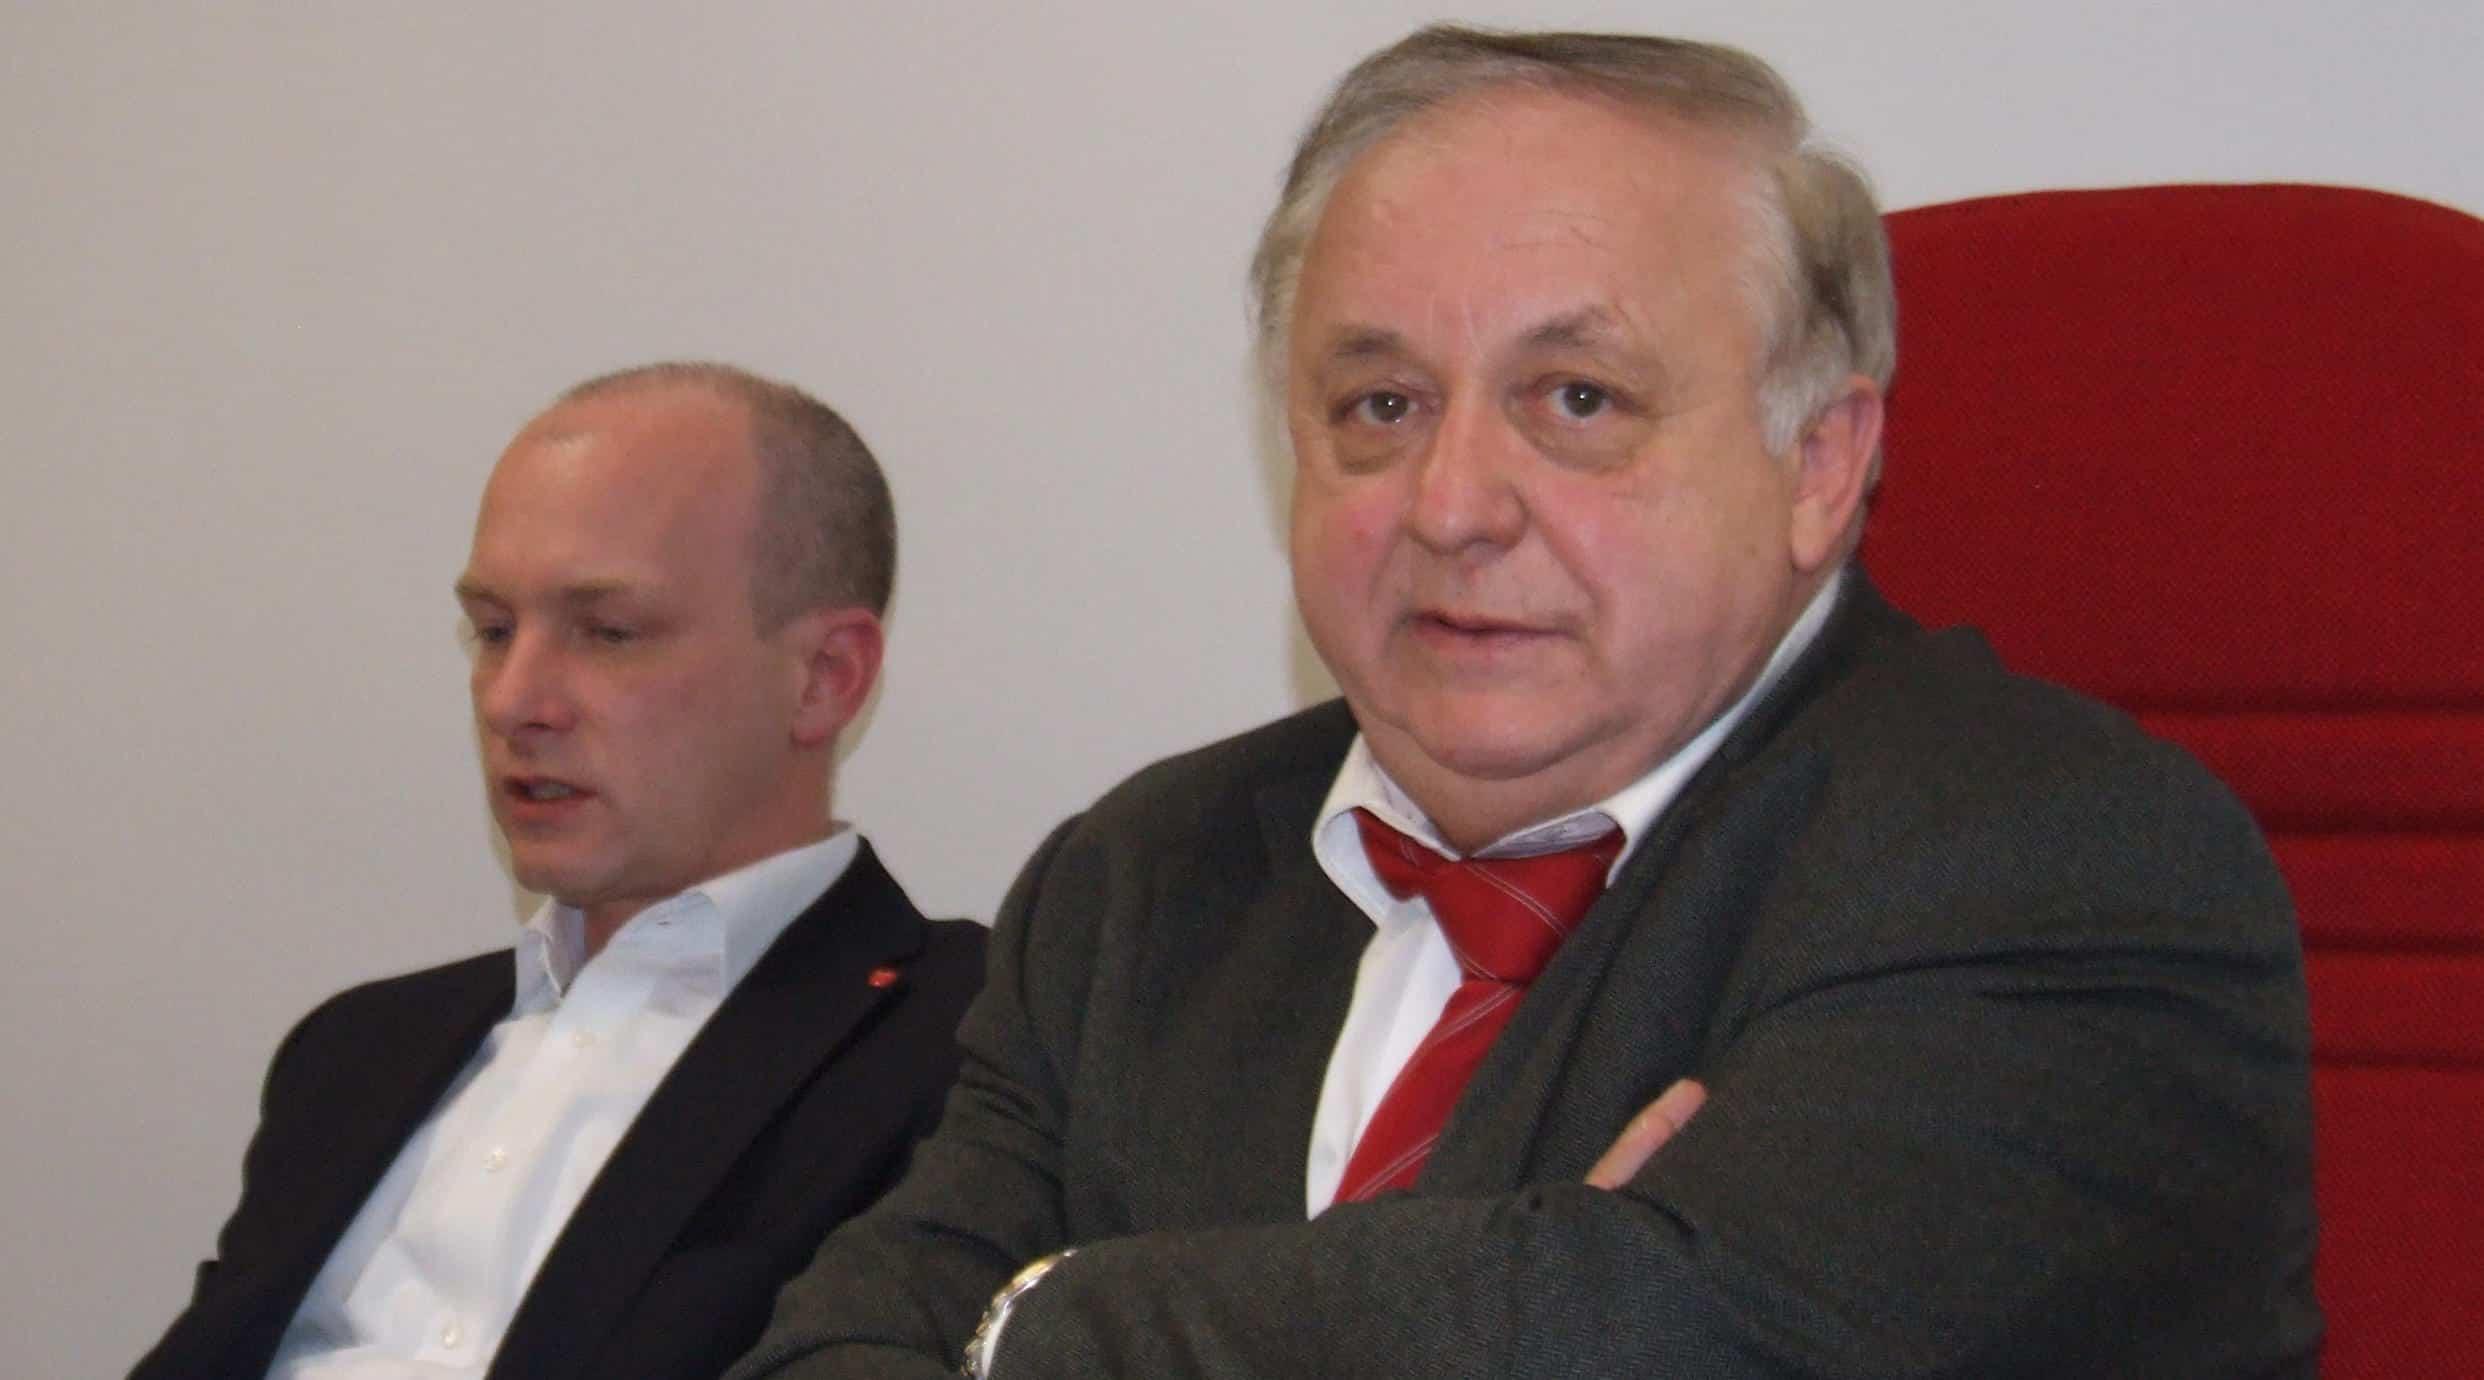 Norbert Hartl Tritt Als Erster Zurück Regensburg Digital